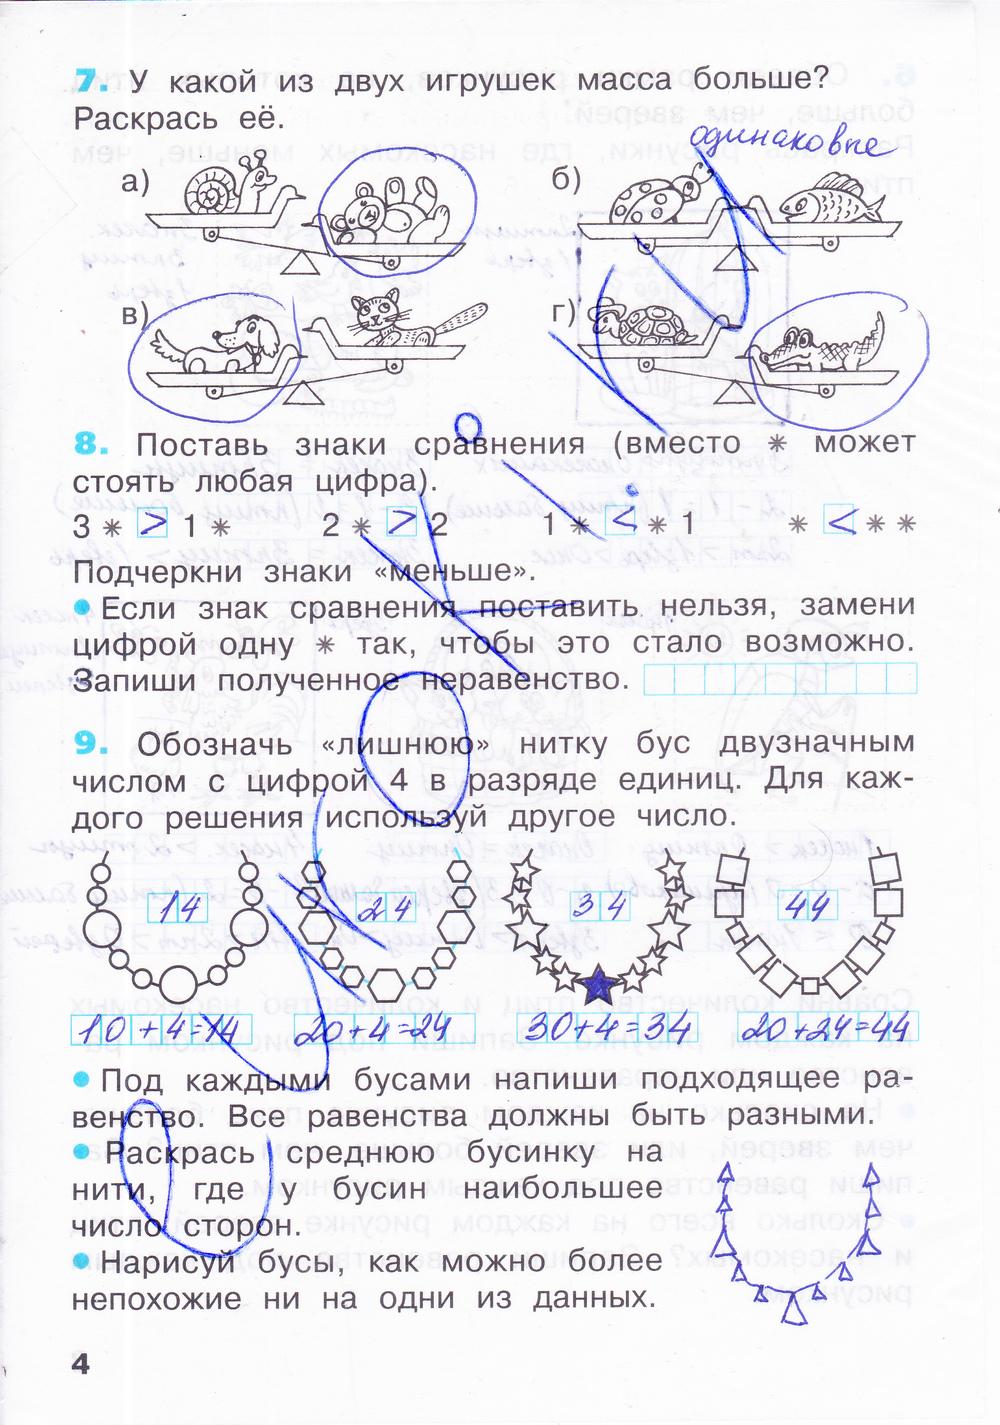 гдз 1 класс математика бененсон рабочая тетрадь 2